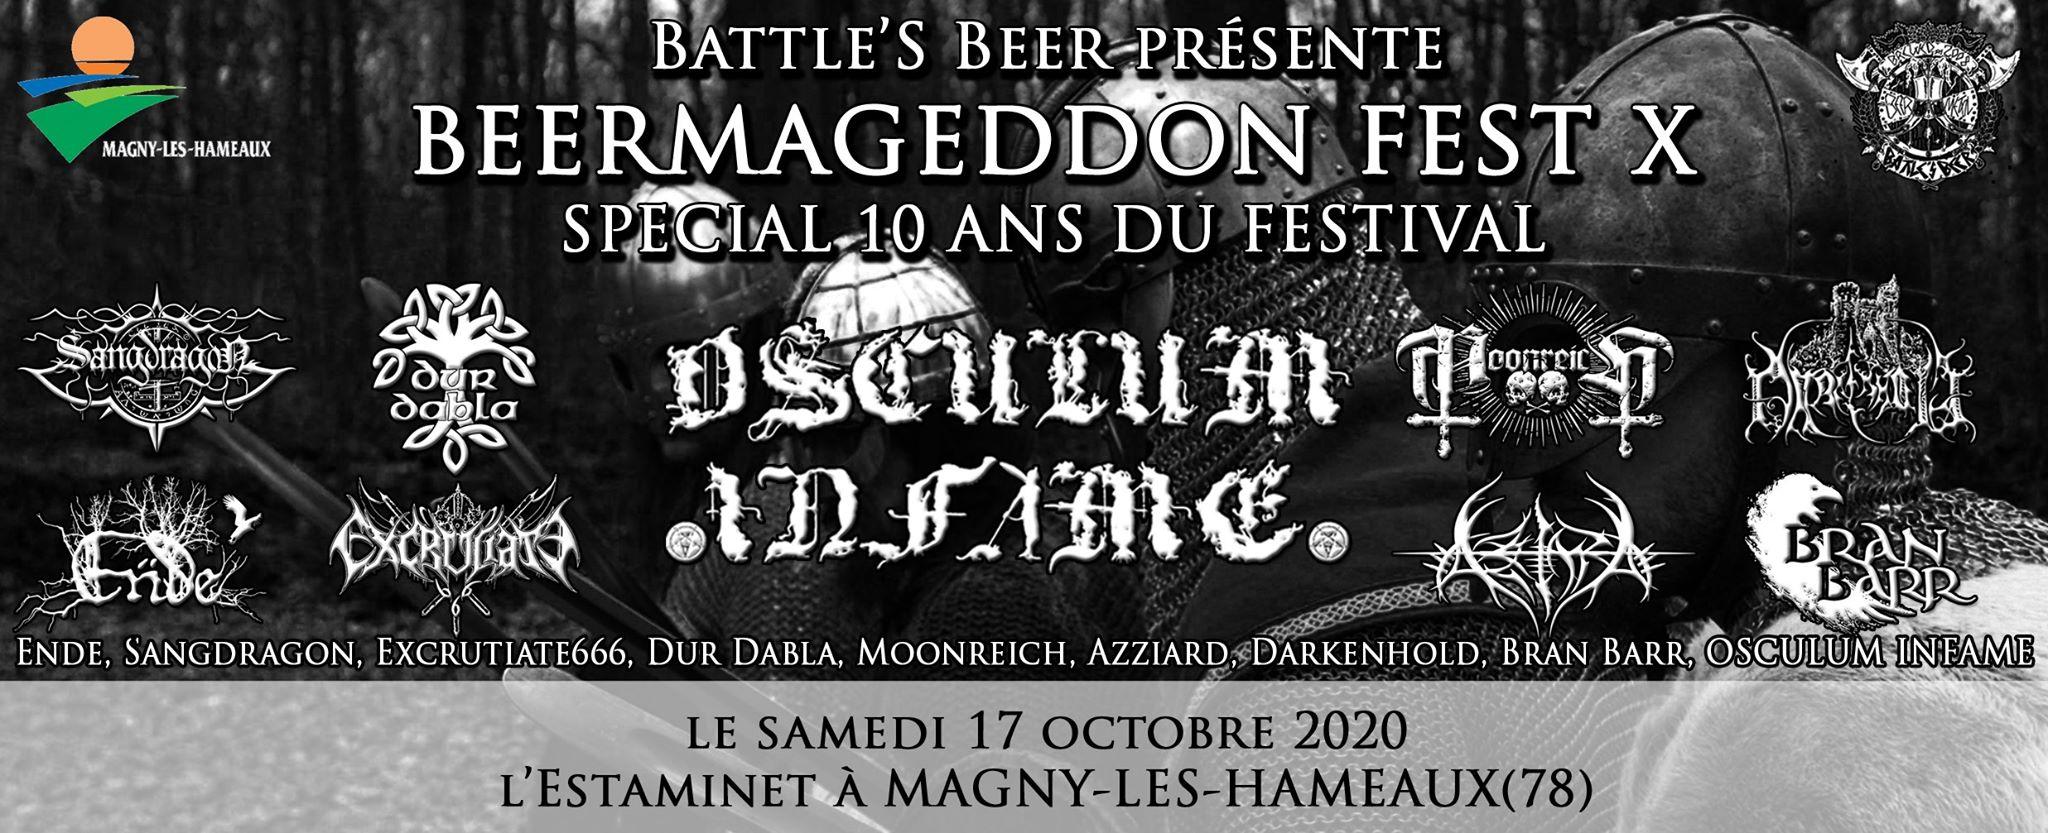 Beermageddon Fest X